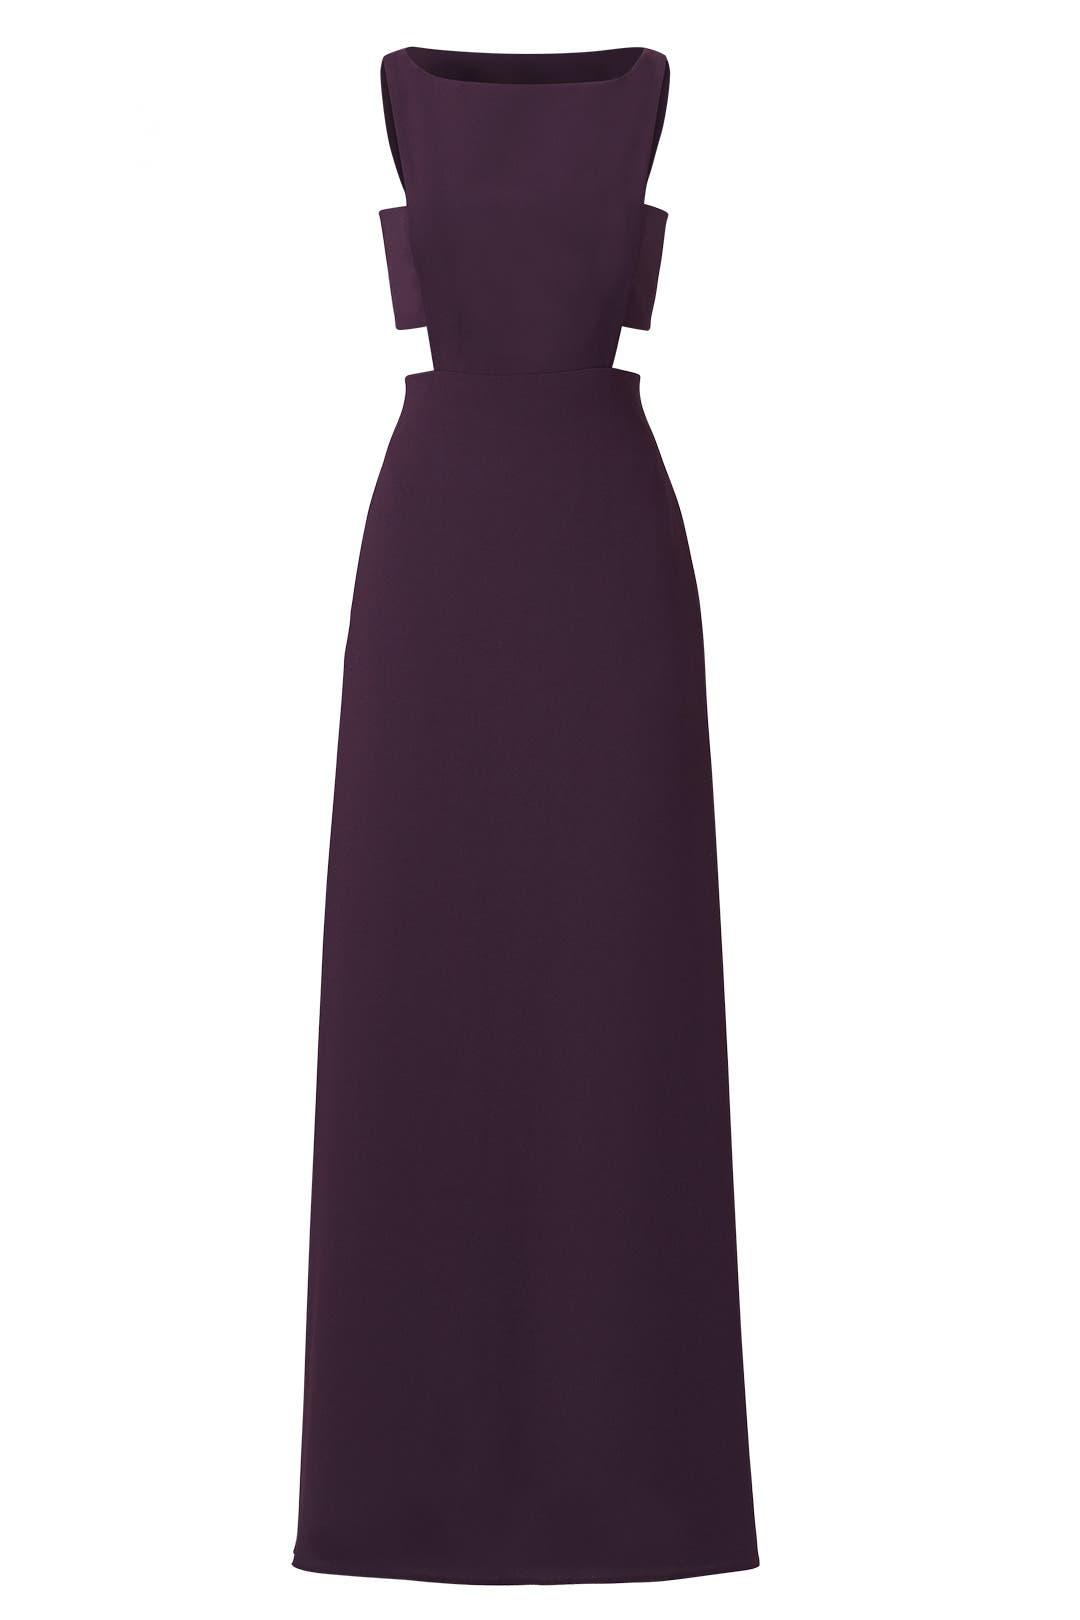 Dresses for Weddings, Formals, Black Tie & More